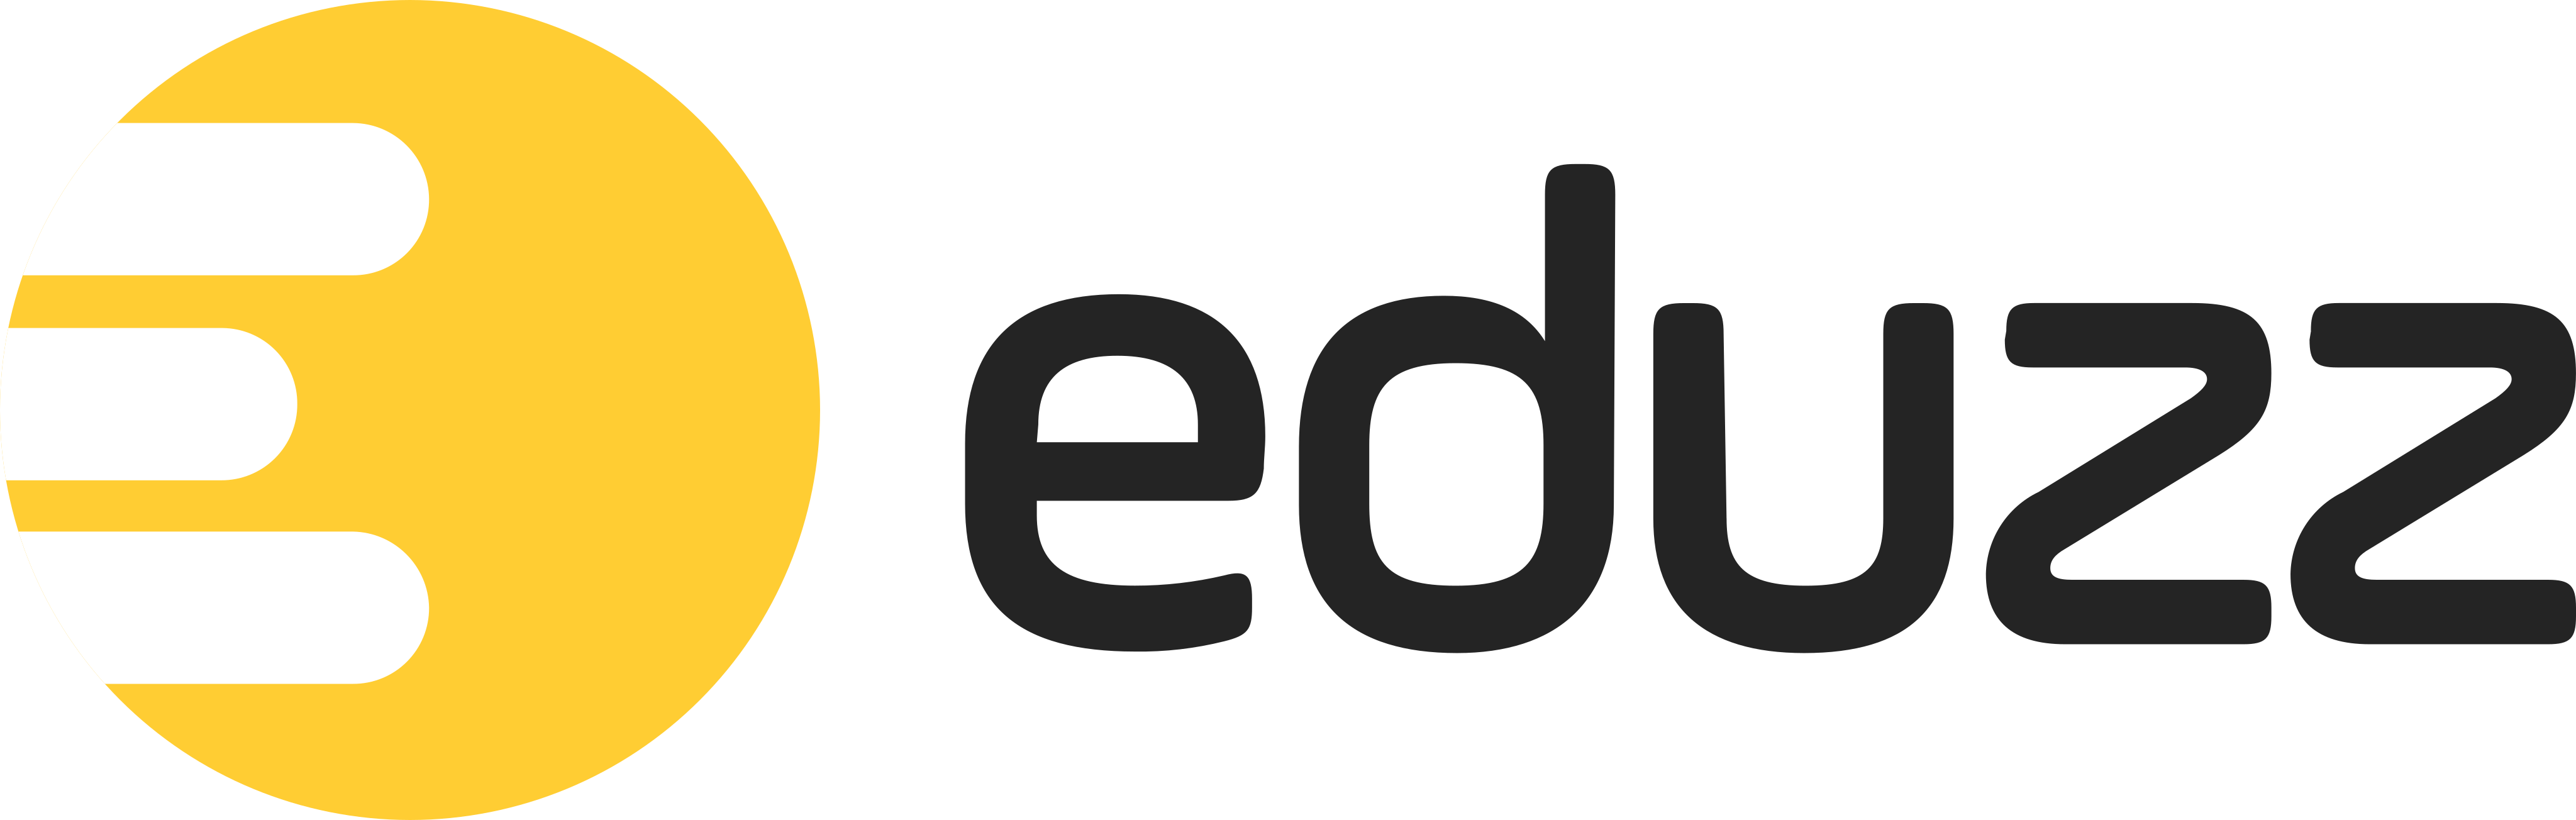 eduzz logo - Eduzz Logo